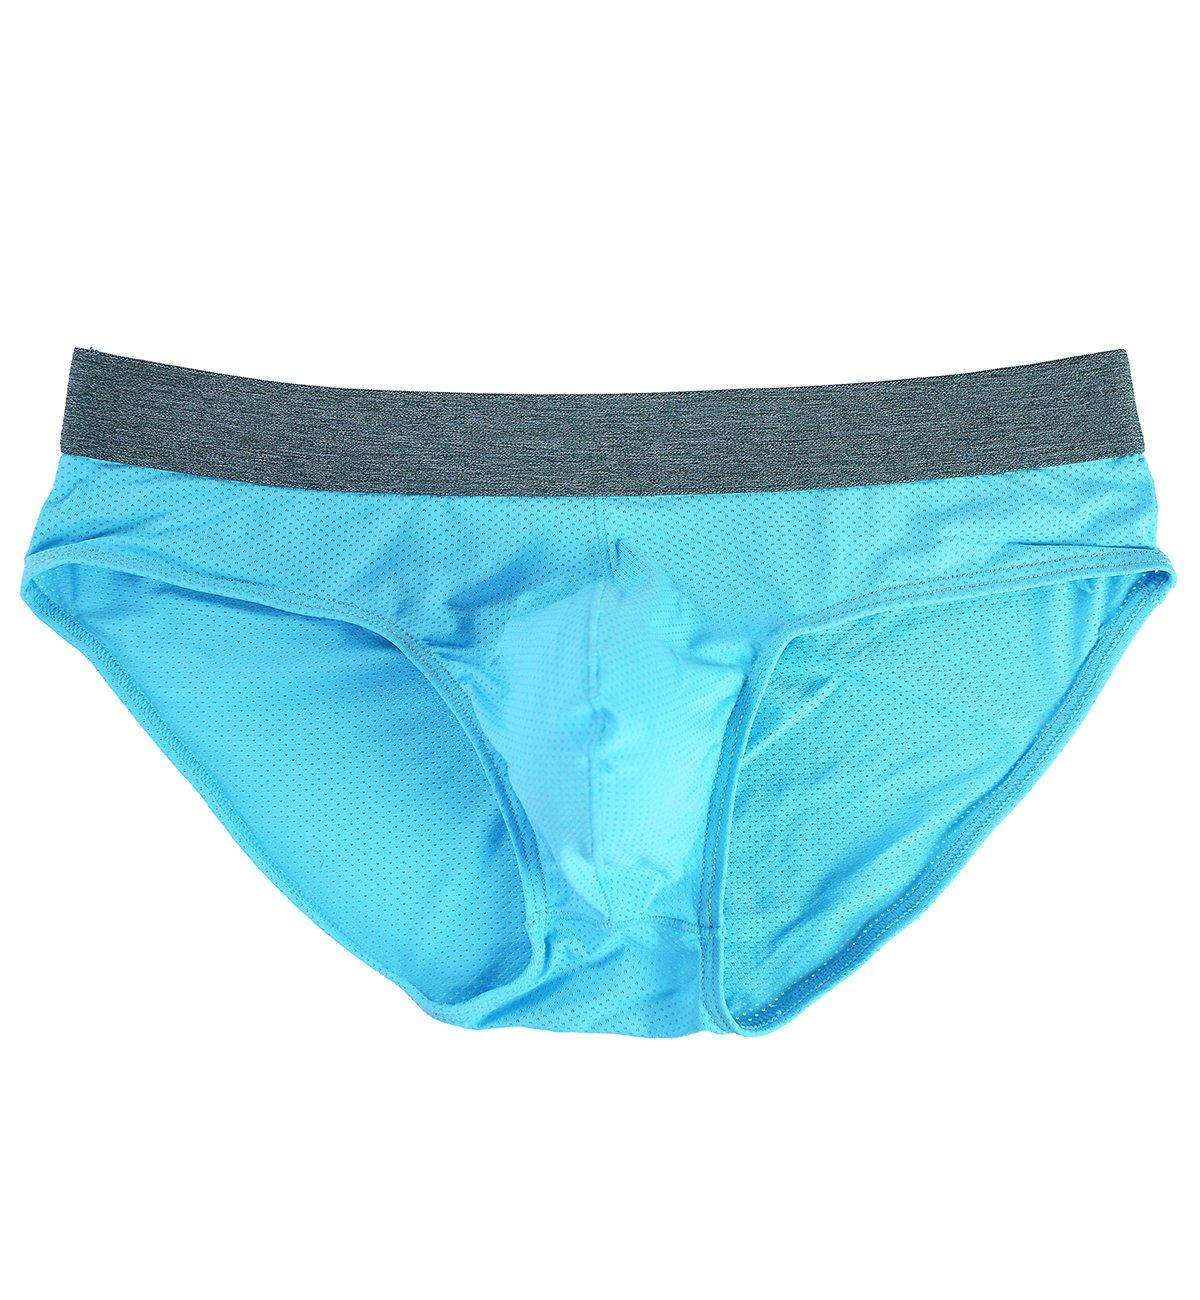 Tyhengta Men's Underwear Body Mesh Briefs 1 Pack Blue Small